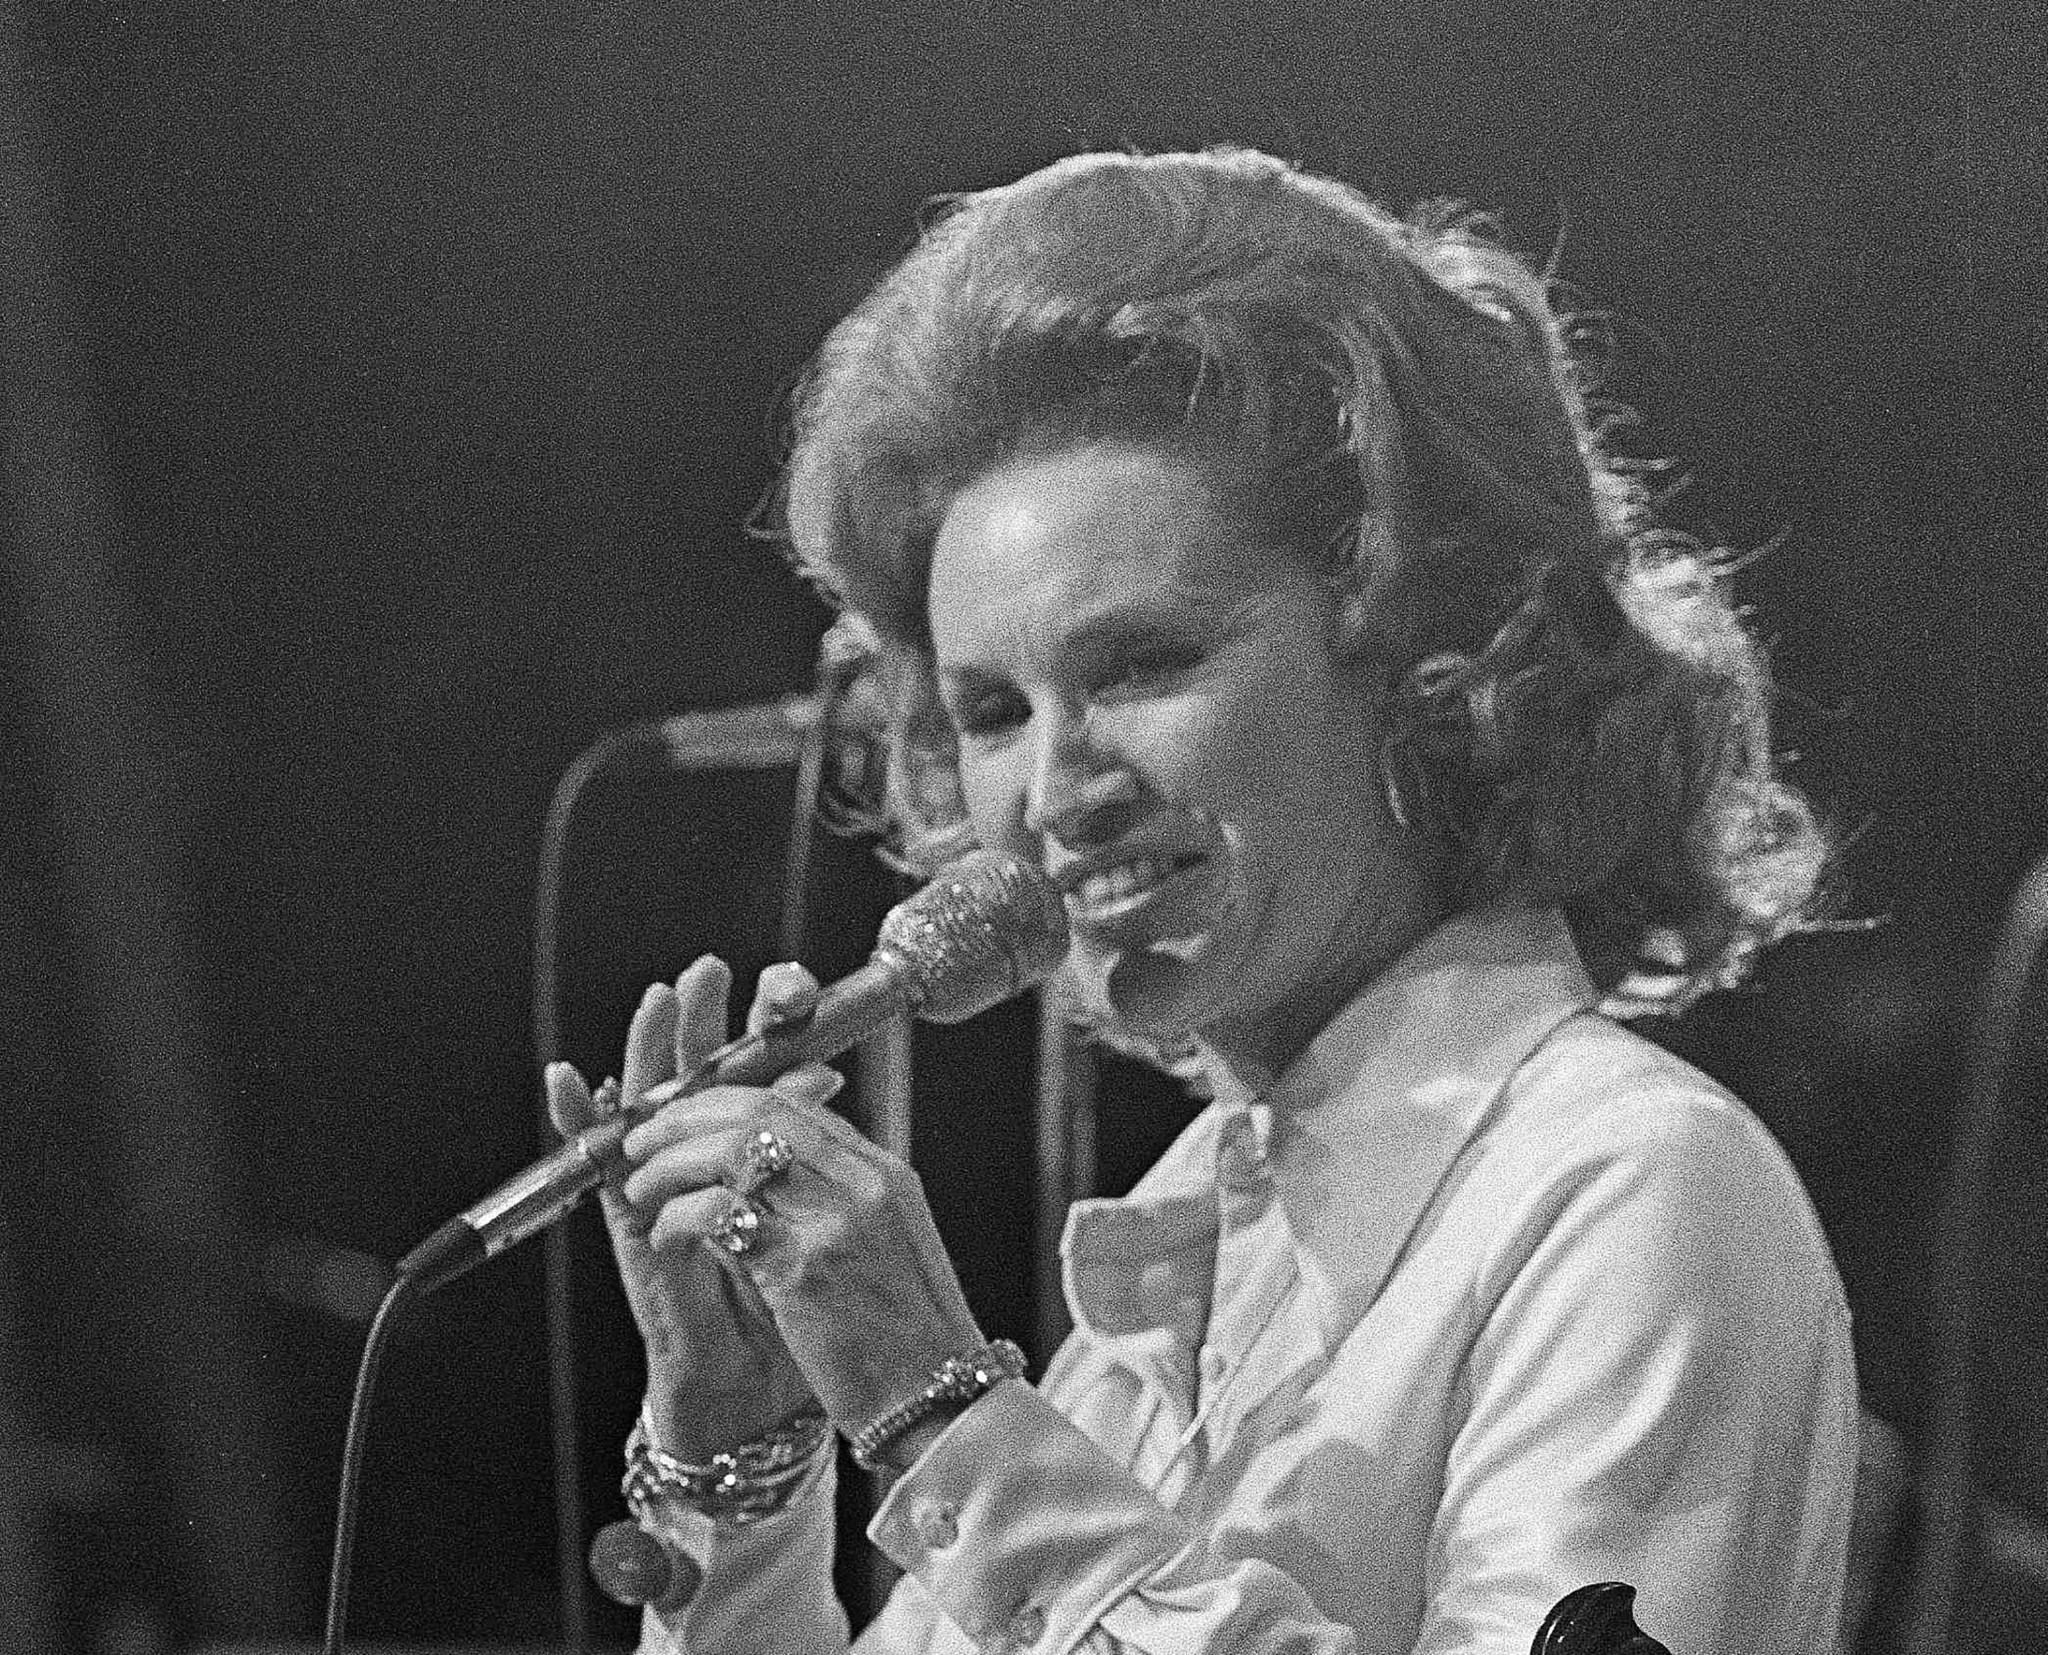 Country singer Jan Howard, Grand Ole Opry member for 49 years, dies at 91